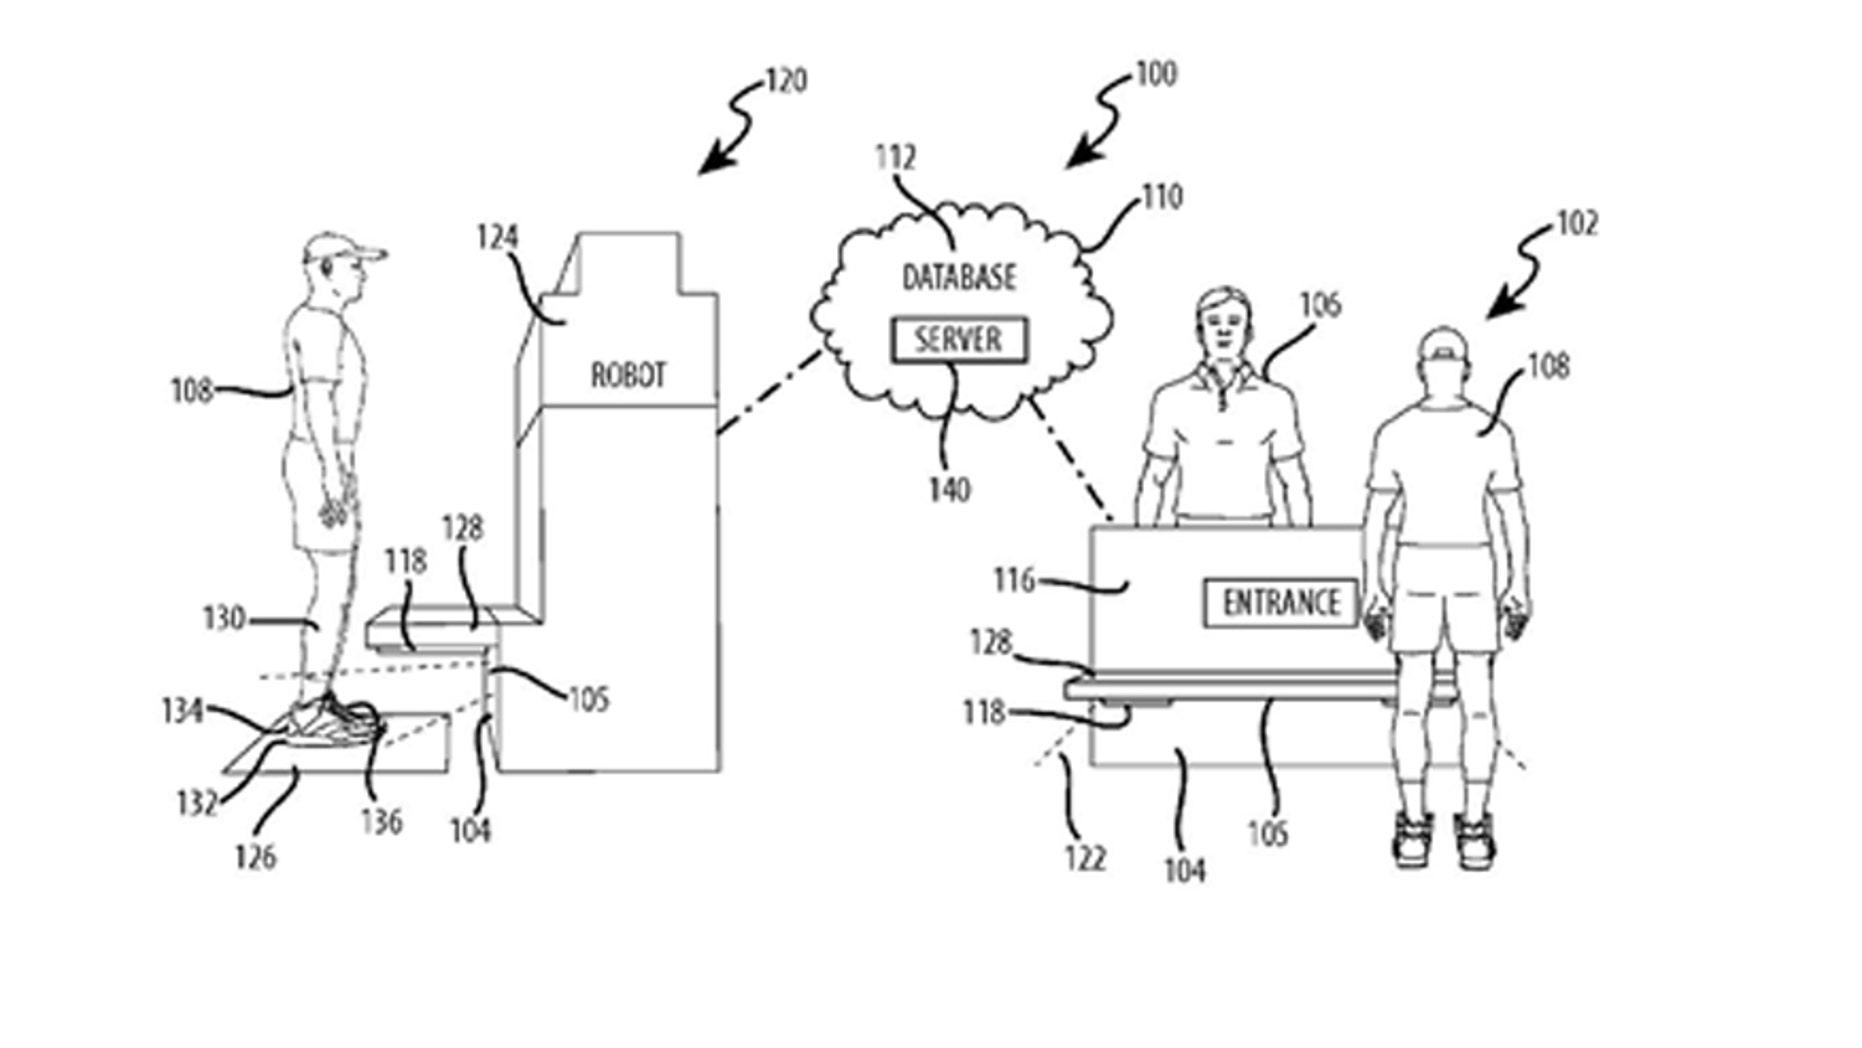 (Disney patent/USPTO).